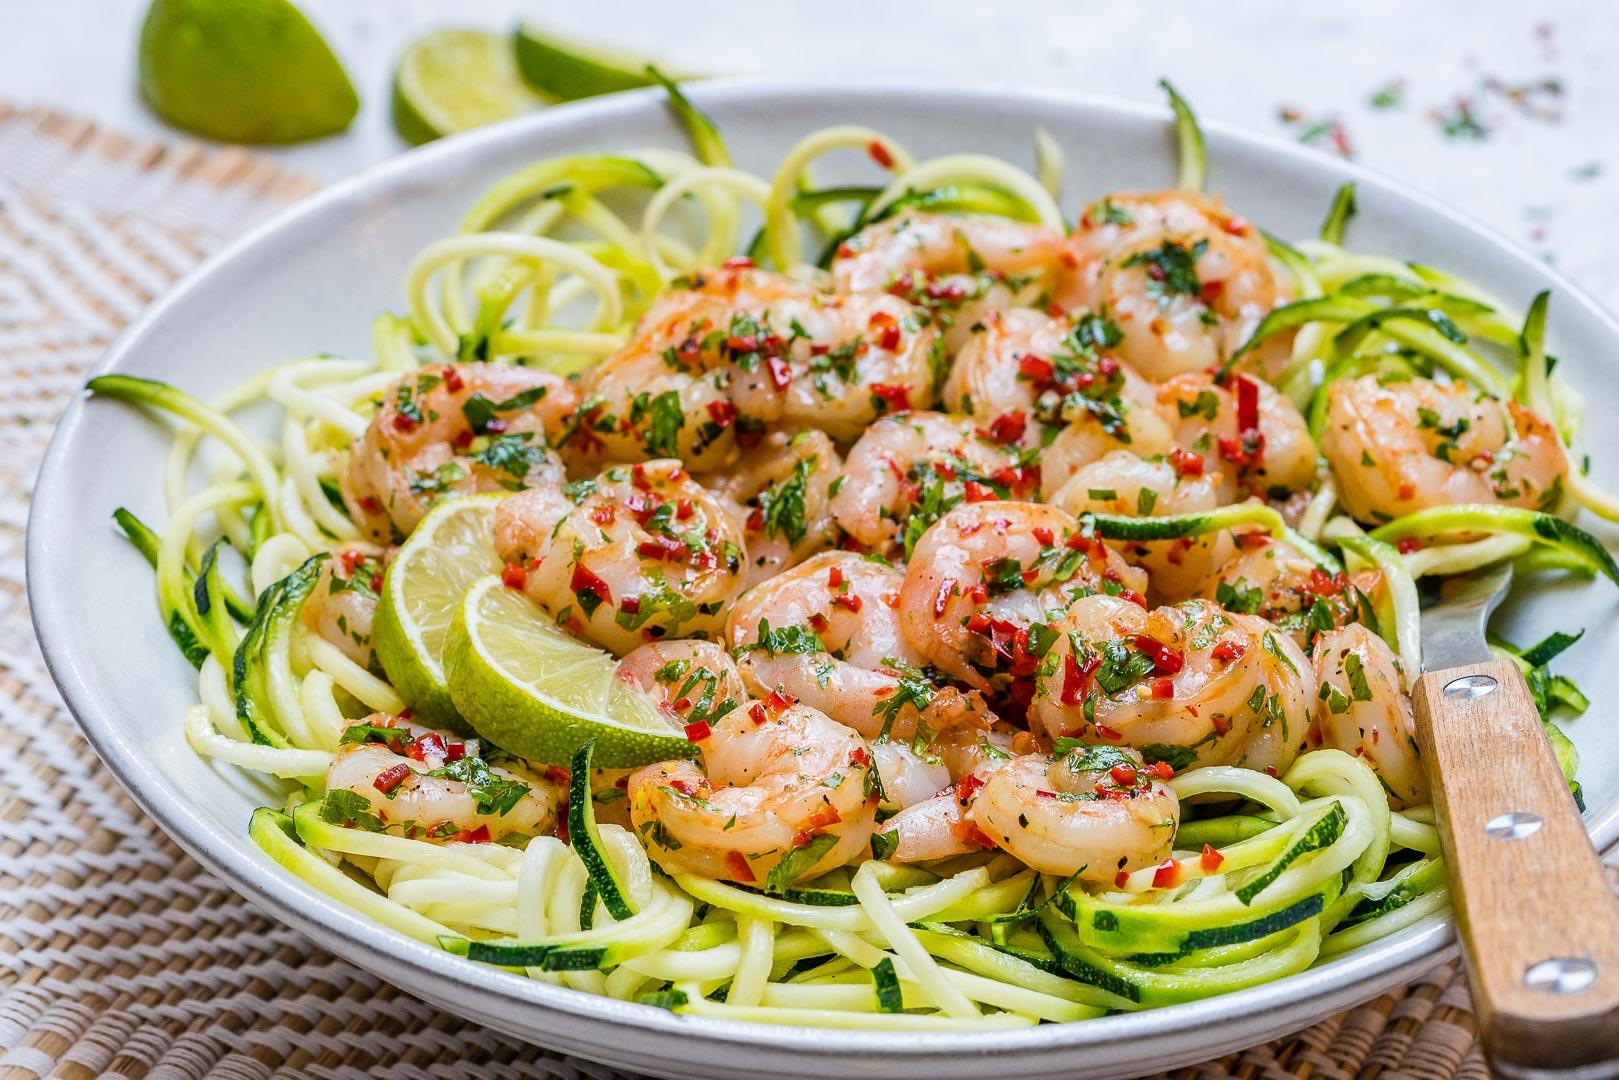 Chili Garlic Shrimp Zoodles Healthy Clean Eats